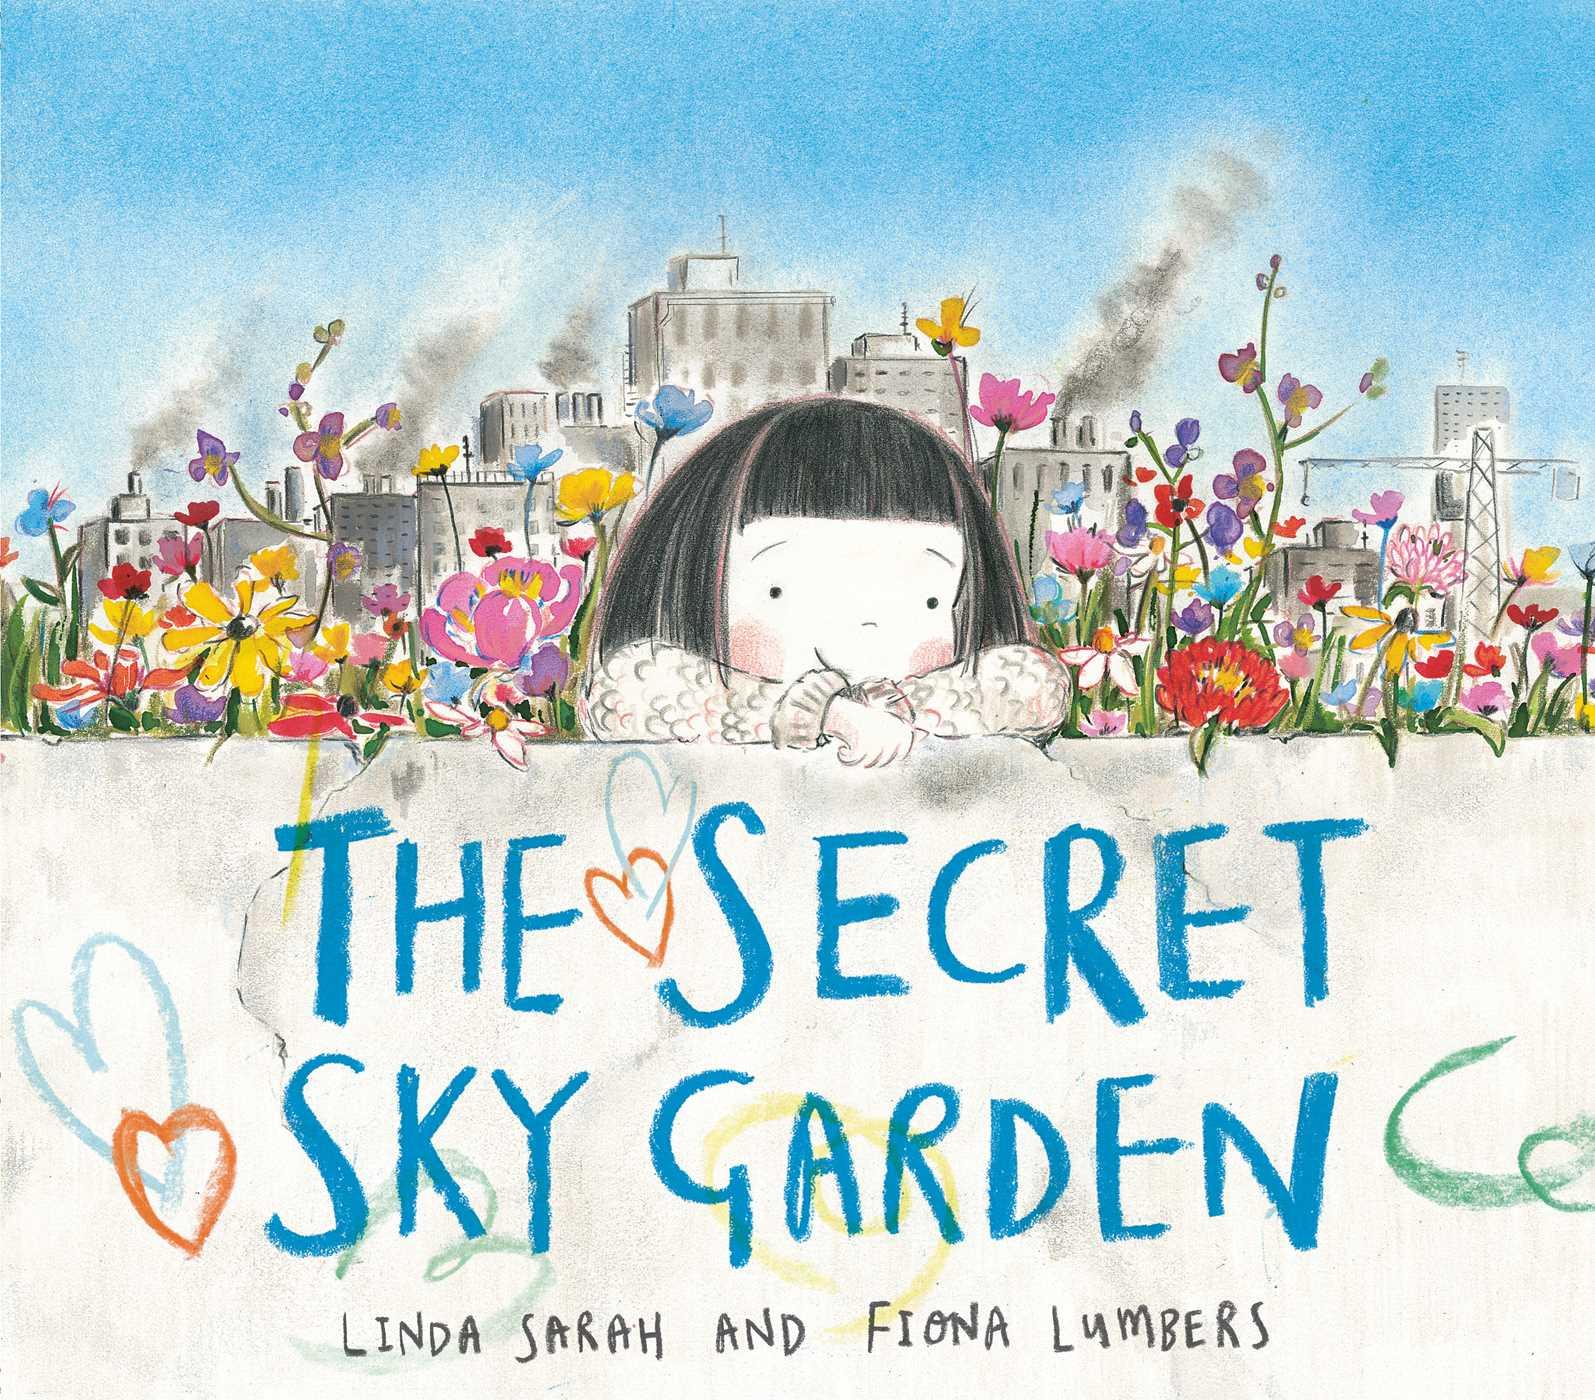 Secret sky garden 9781471119255 hr